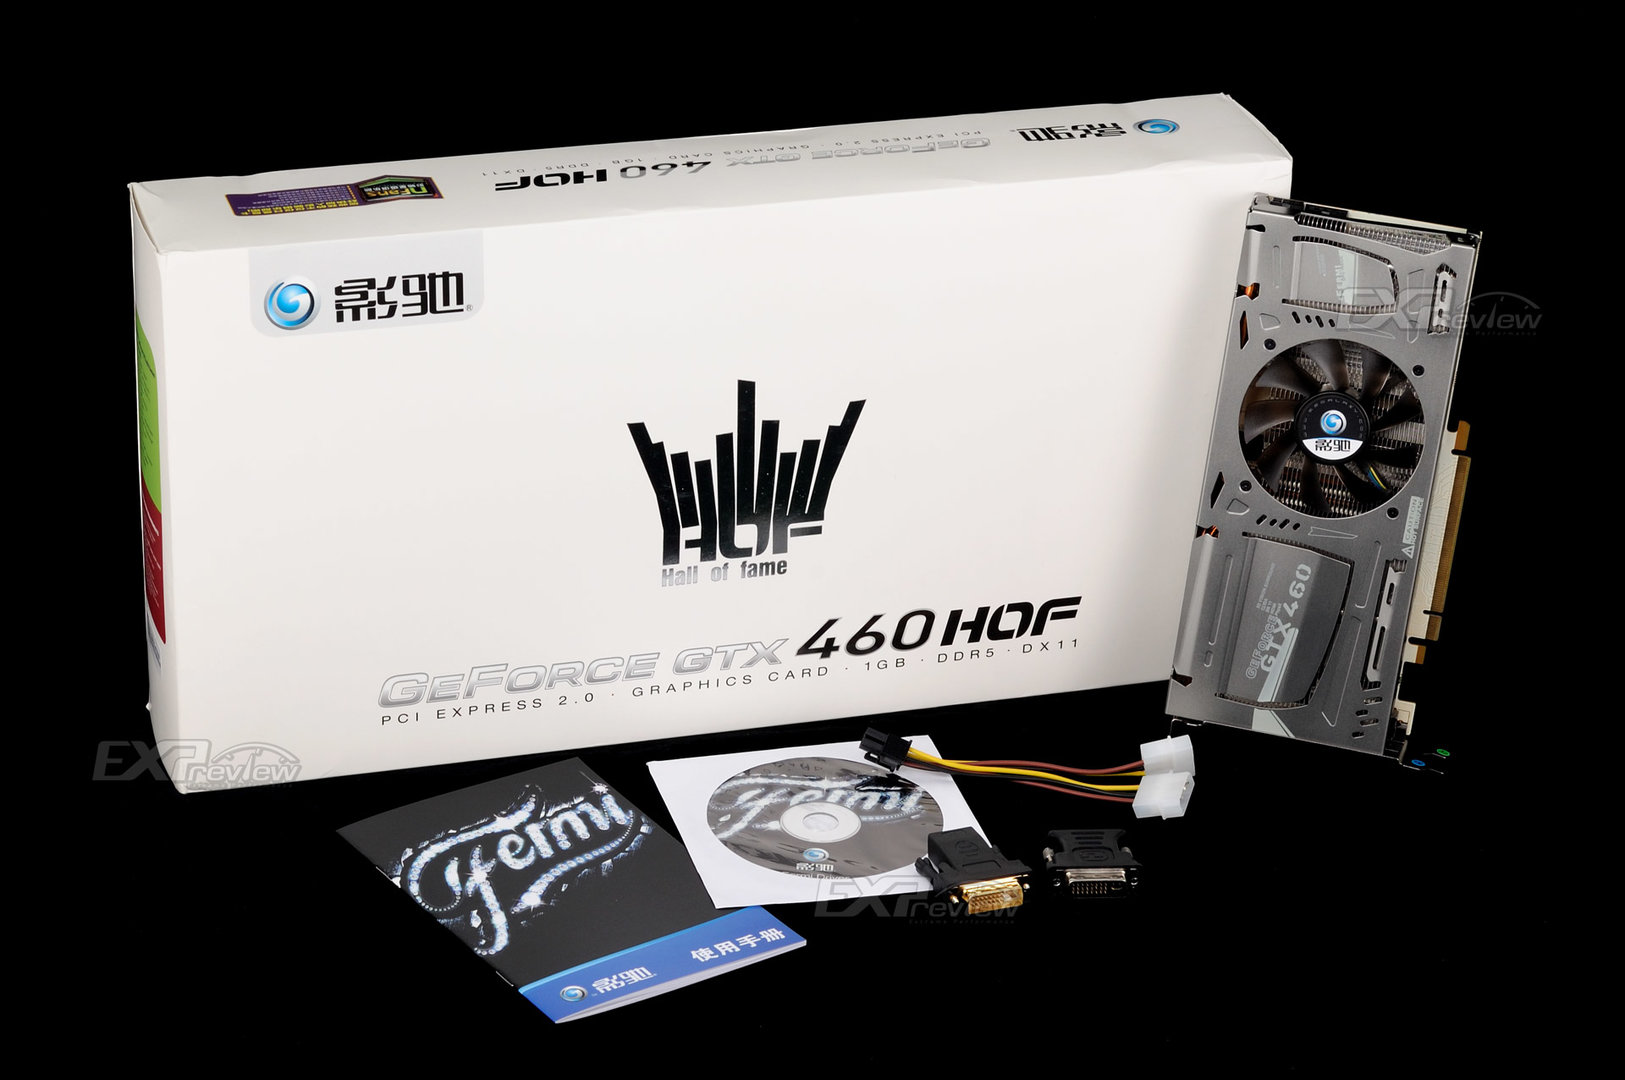 Galaxy GeForce GTX 460 HOF (Hall of Fame)